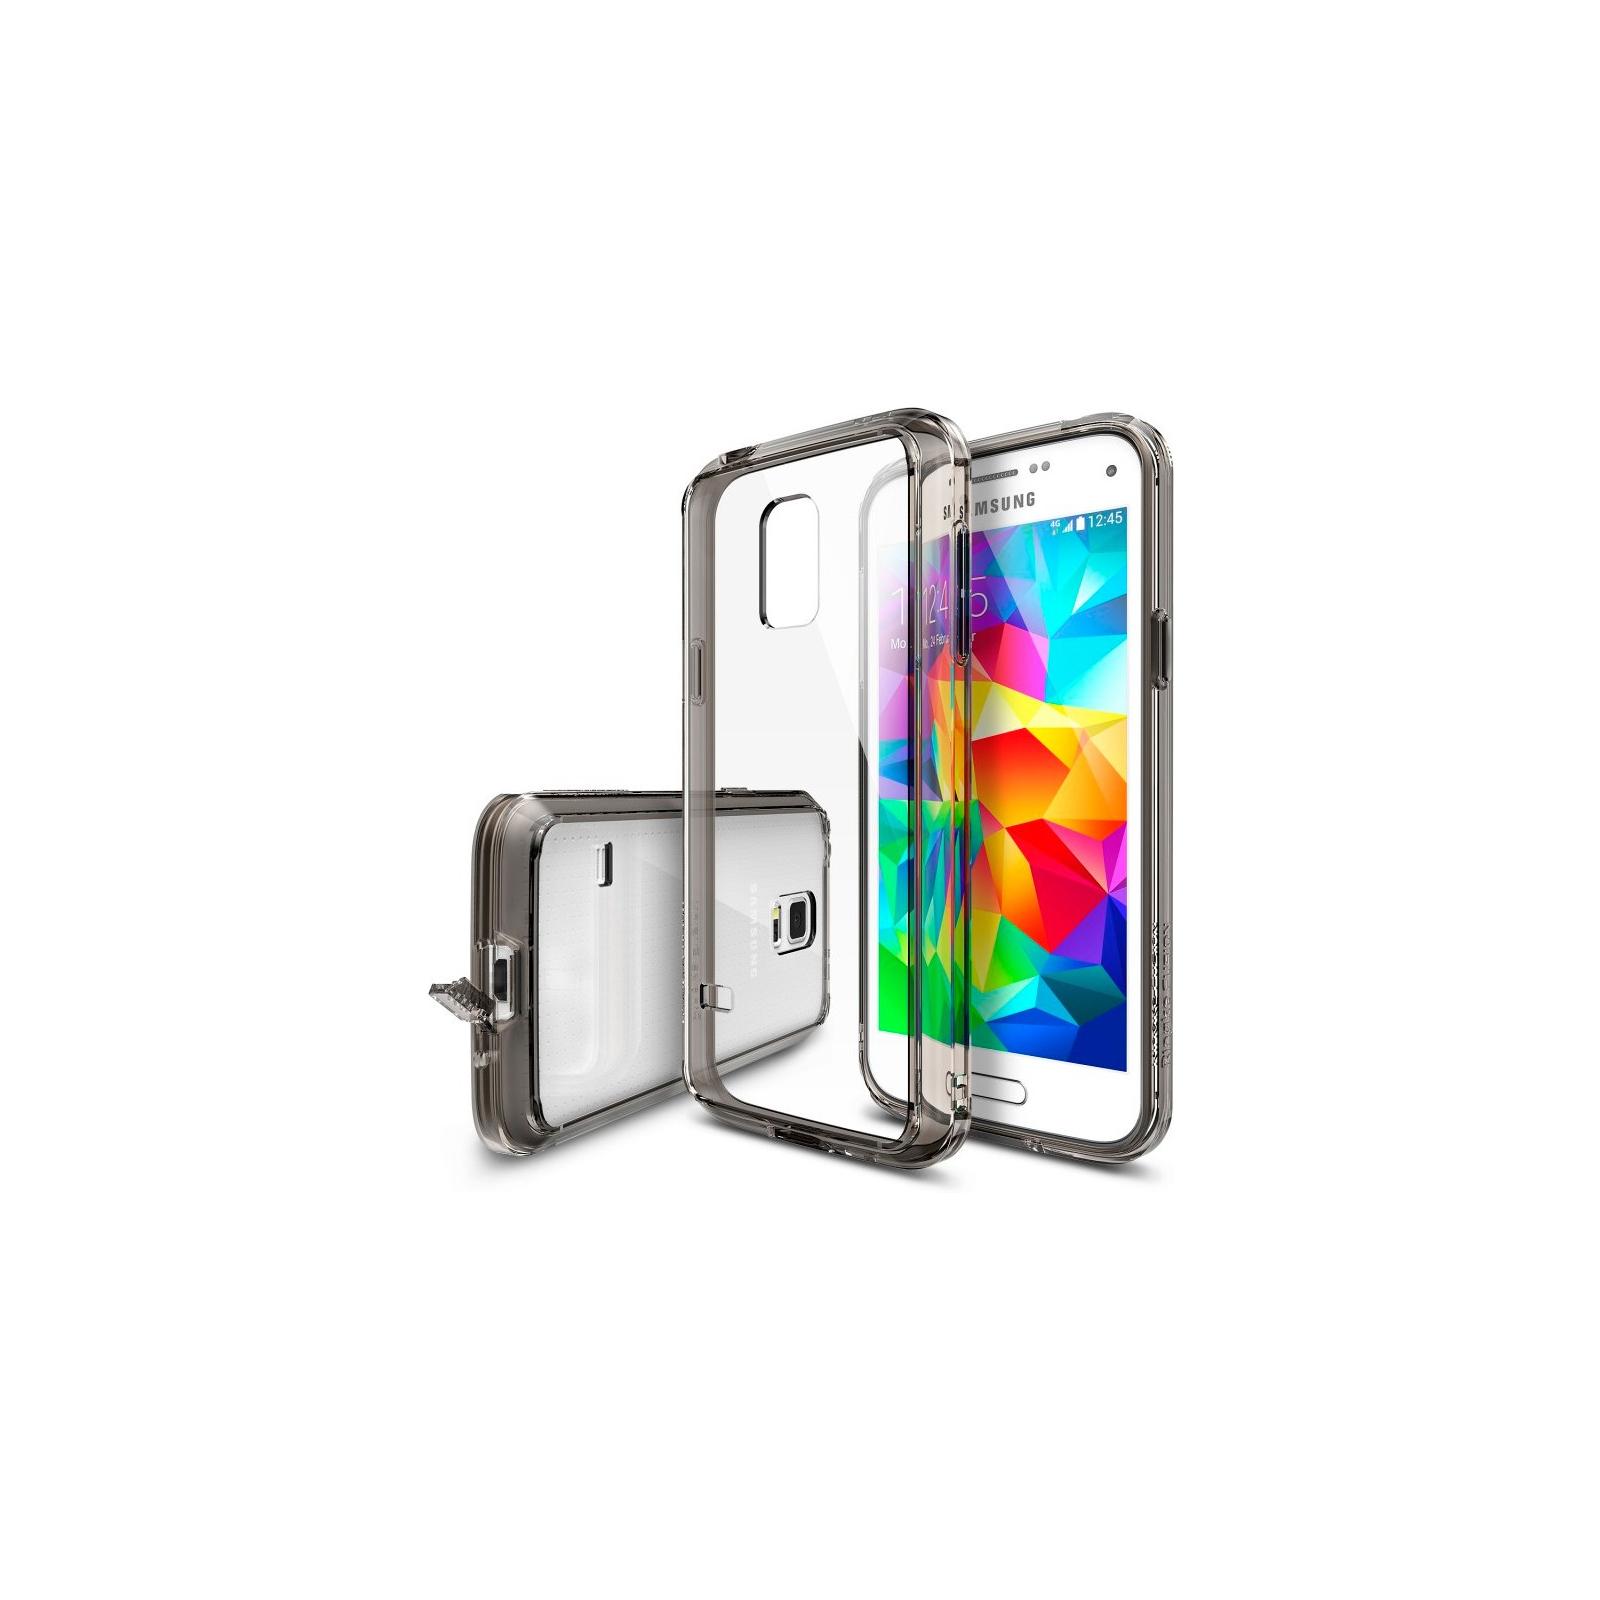 Чехол для моб. телефона Ringke Fusion для Samsung Galaxy S5 mini (Smoke Black) (550678)